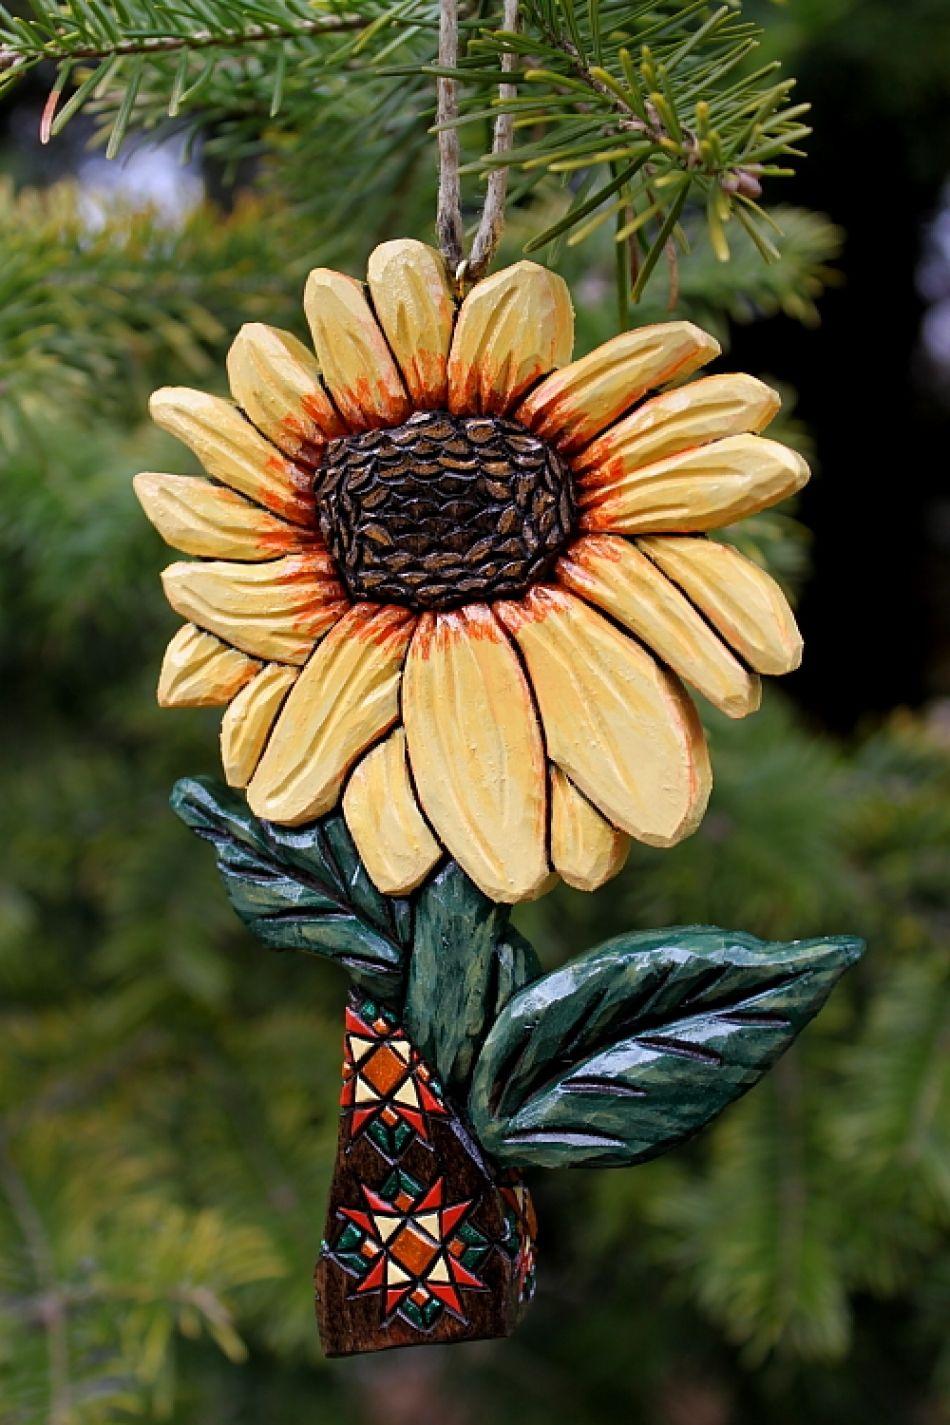 Sunflower Ornament Ornaments, Christmas tree ornaments